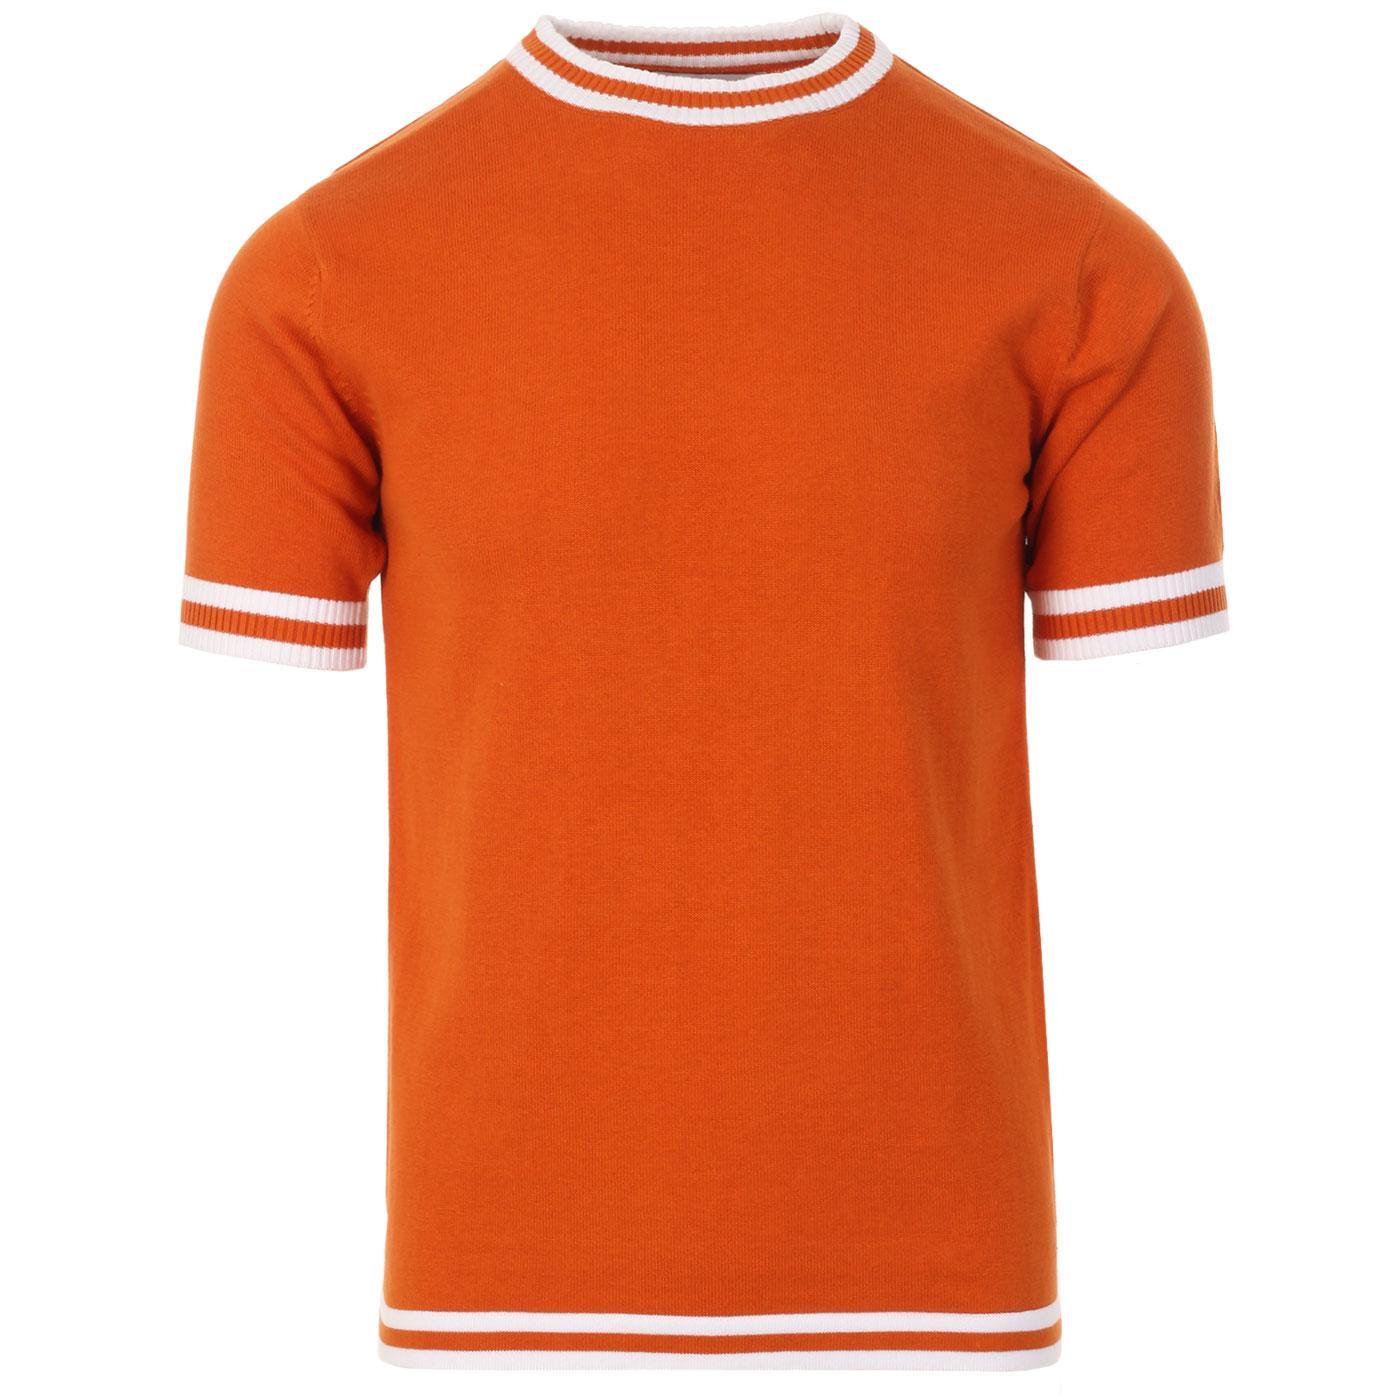 Moon MADCAP ENGLAND Mod Knit Tee (Burnt Orange)